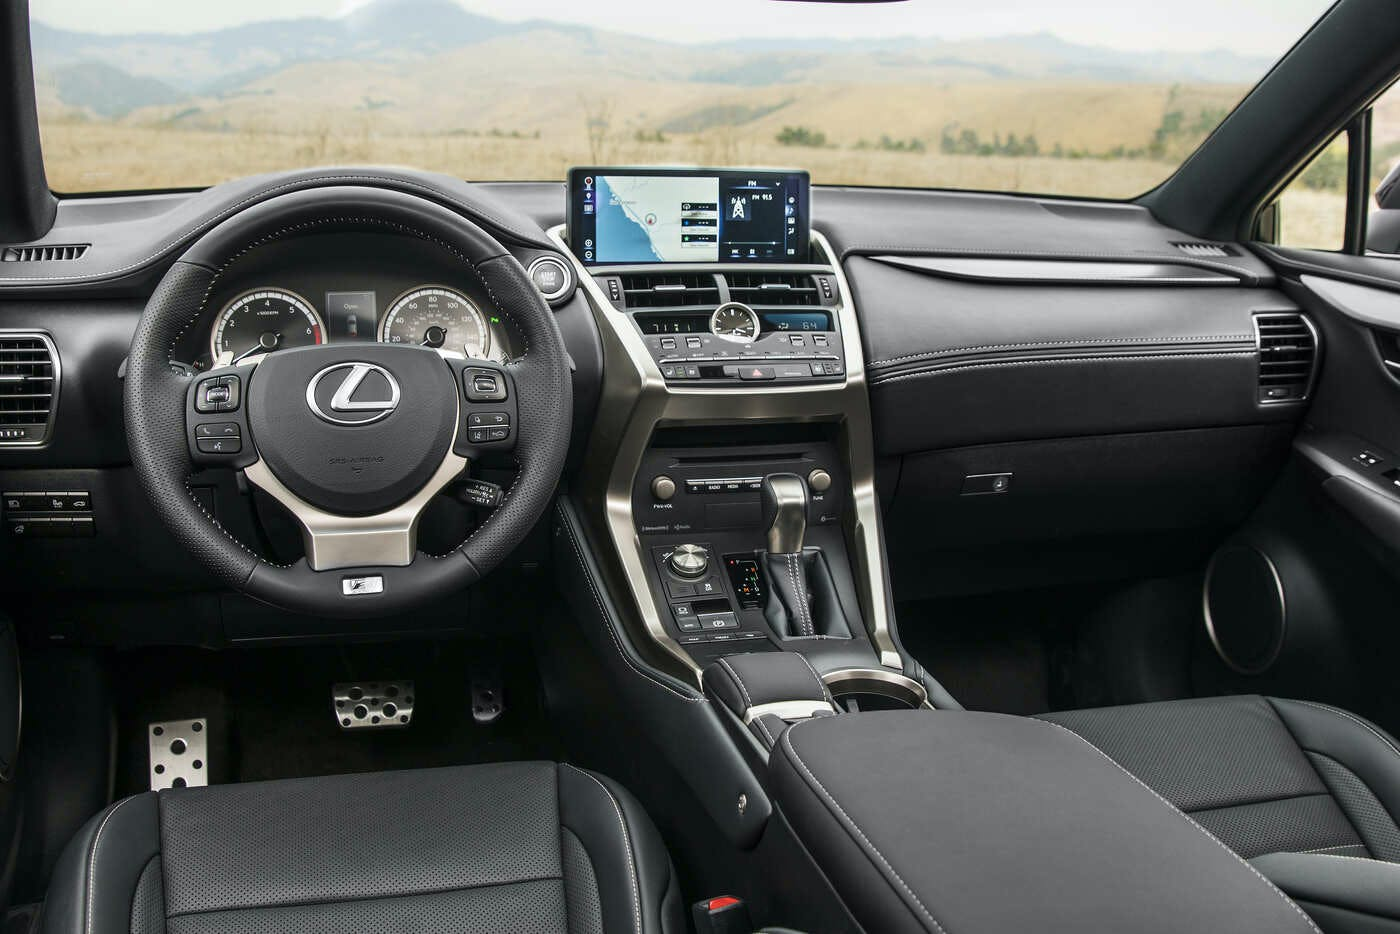 2020 Lexus Nx Performance and New Engine